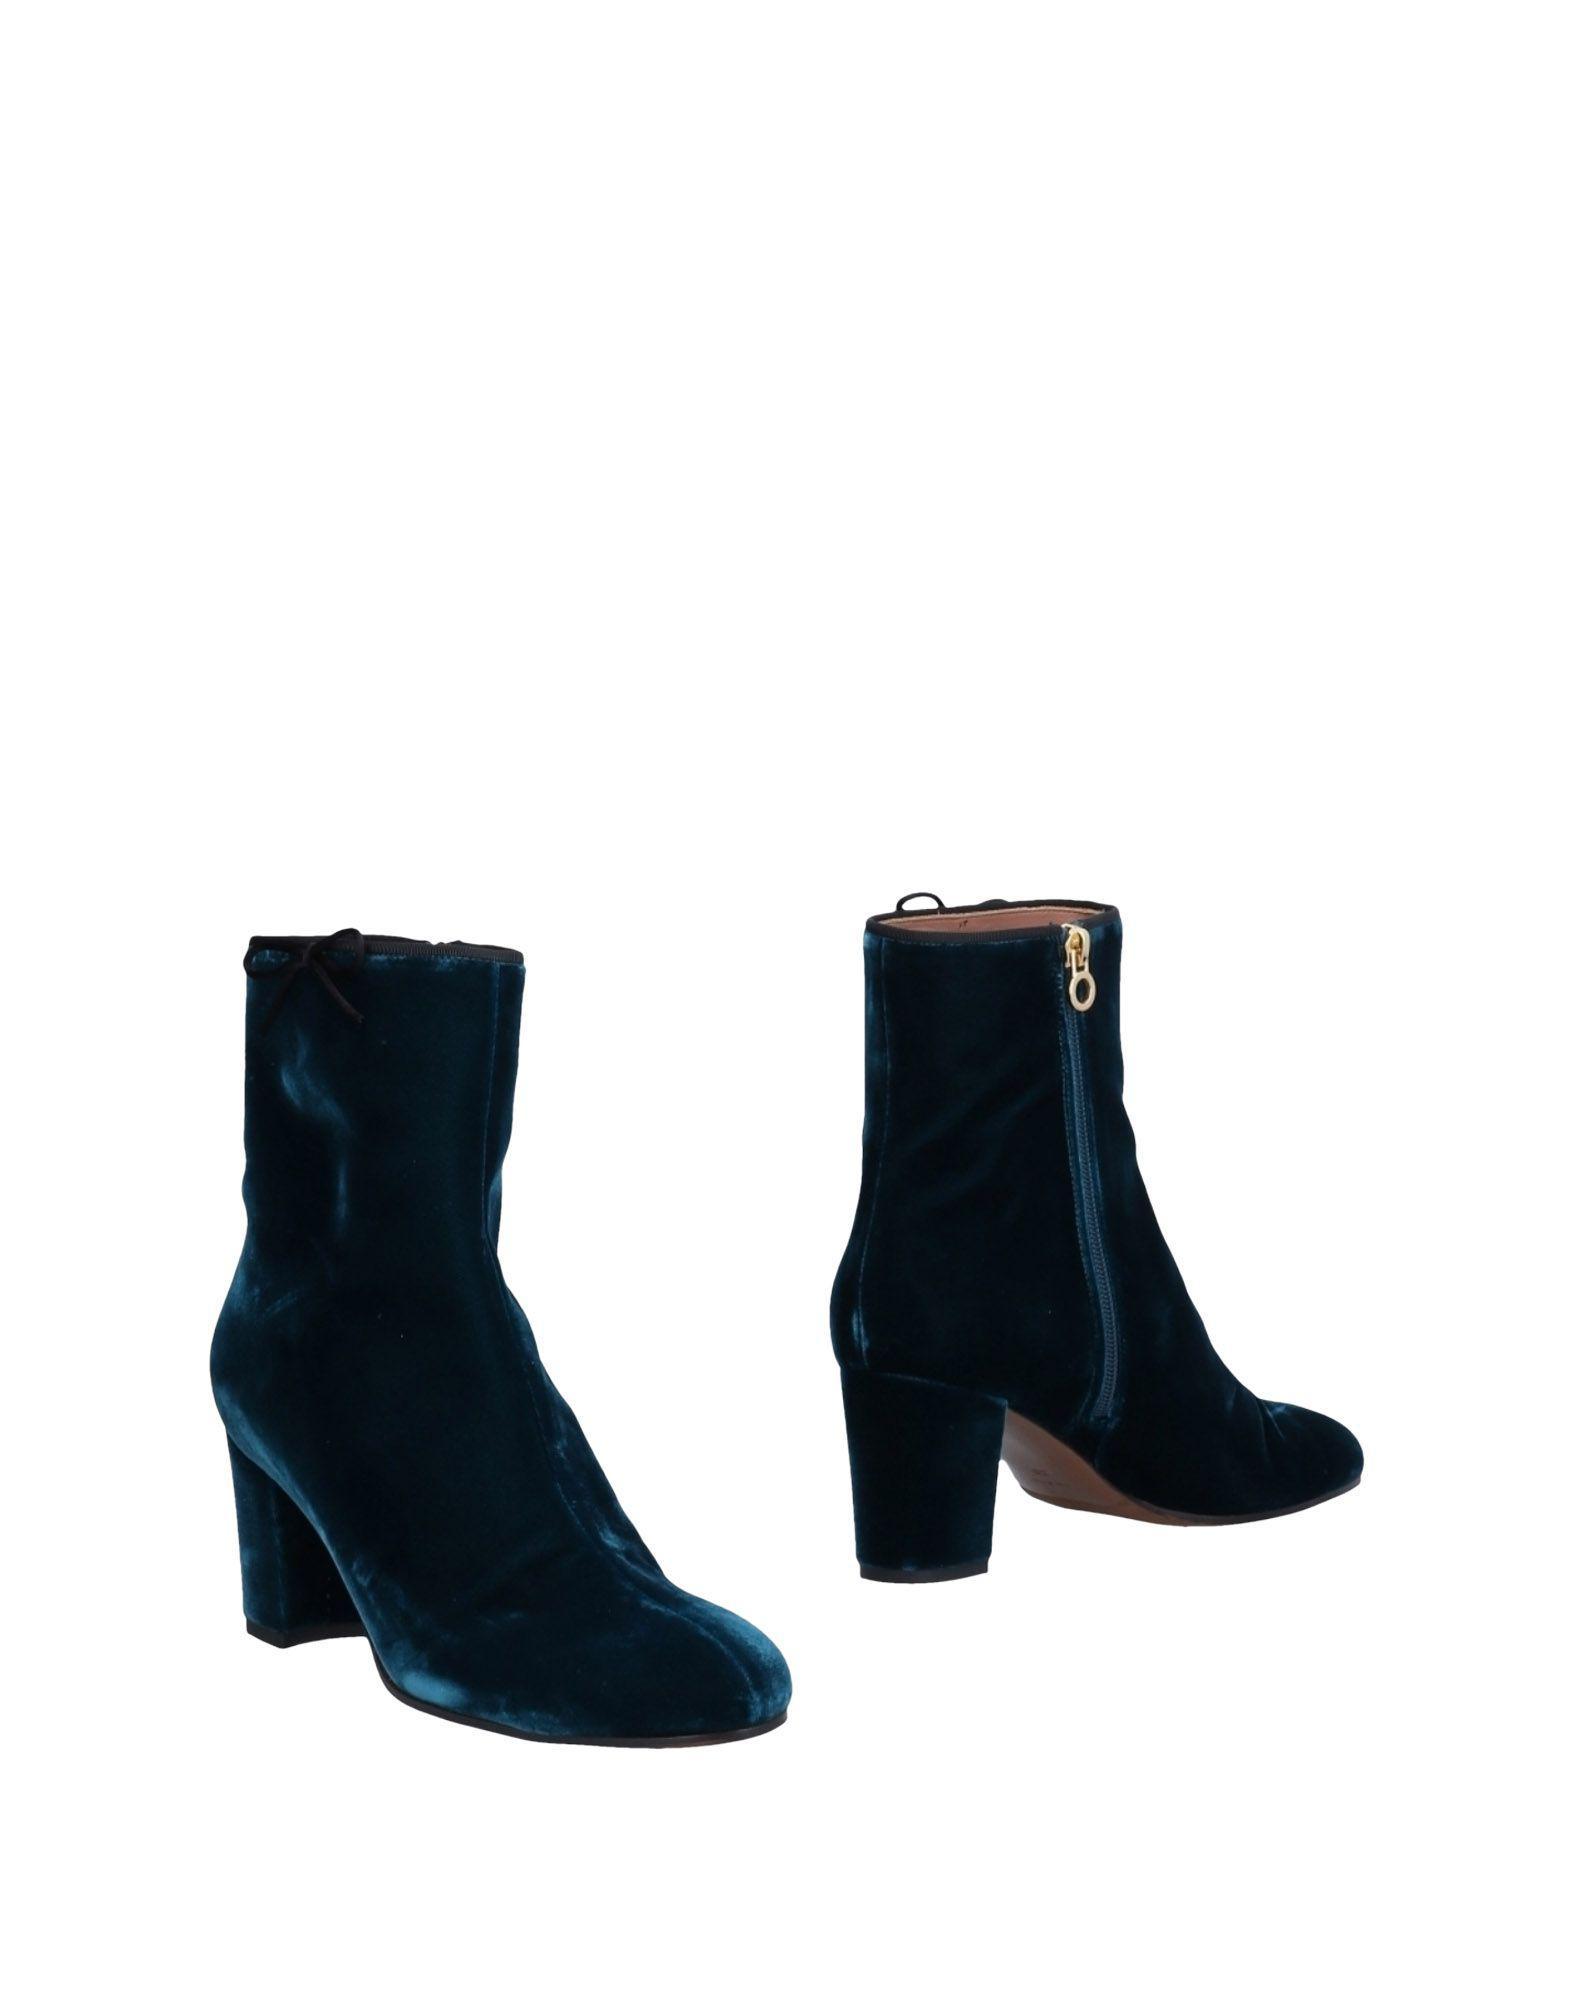 L Autre Chose. Botines de caña alta de mujer de color azul 18eb63d1b5075